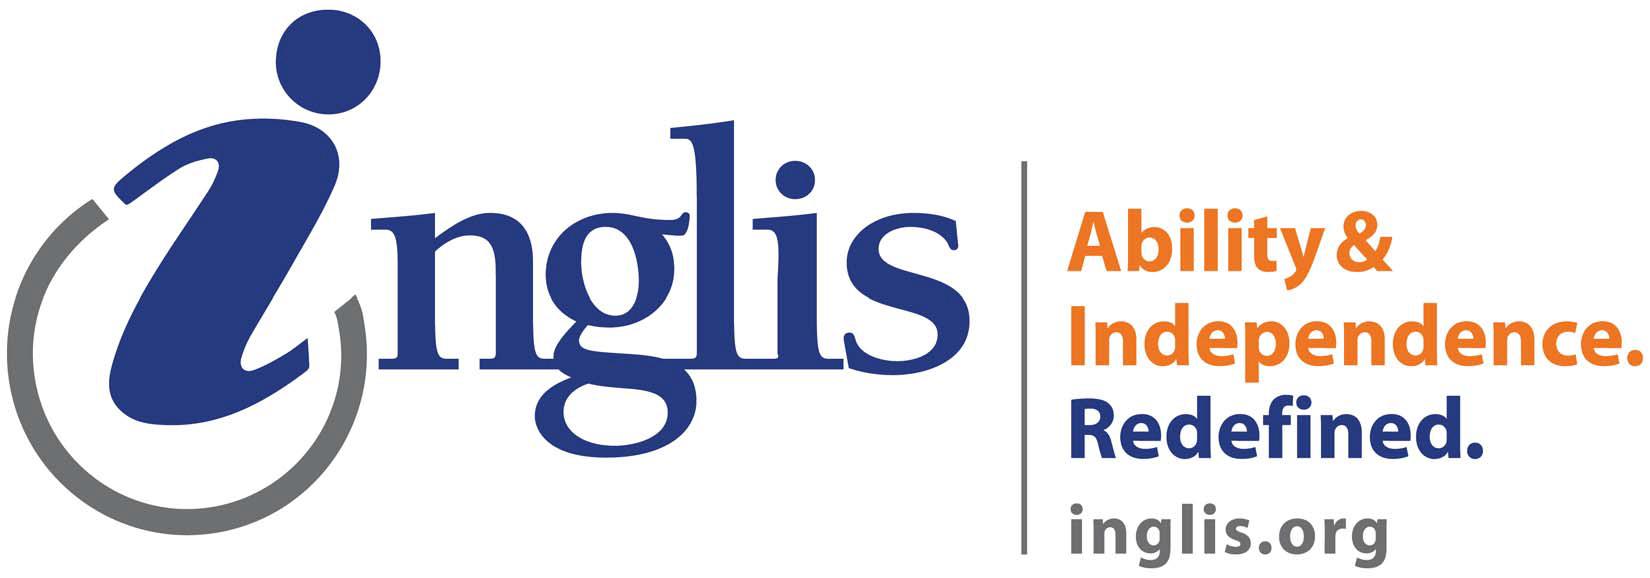 inglis logo tag_web_illus_bizcrds